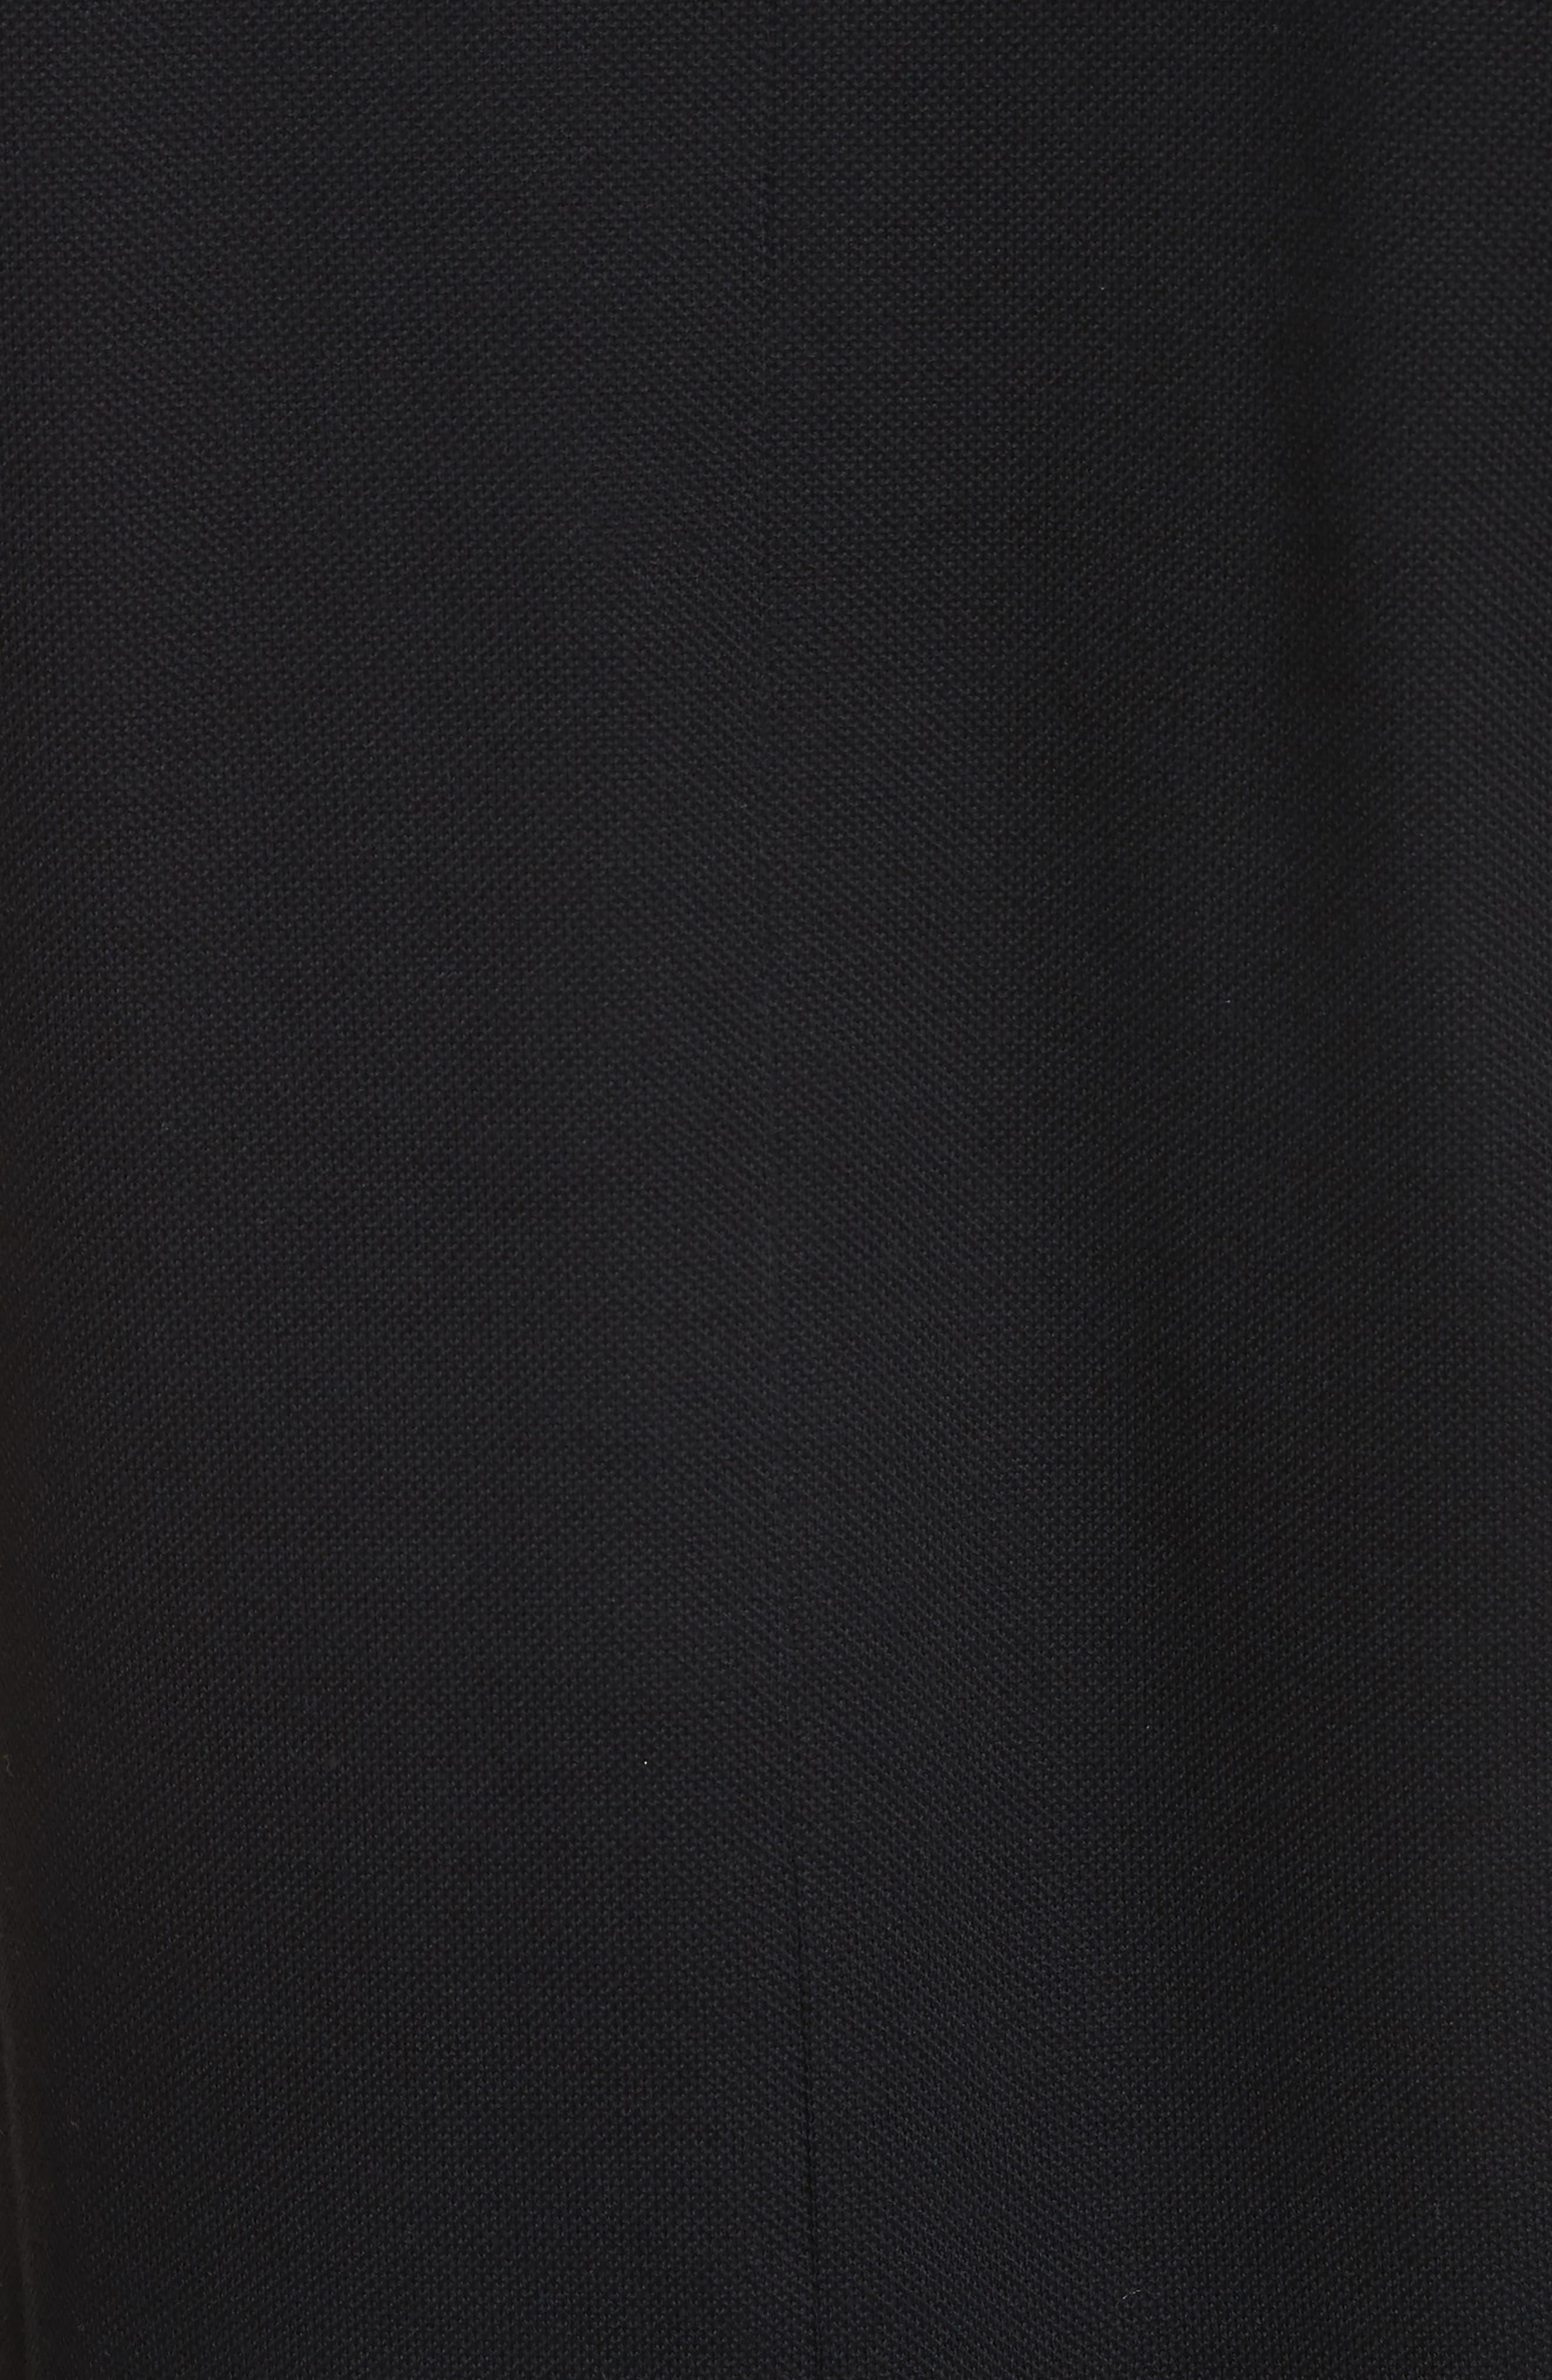 Givenchcy Logo Polo Shirt,                             Alternate thumbnail 5, color,                             001